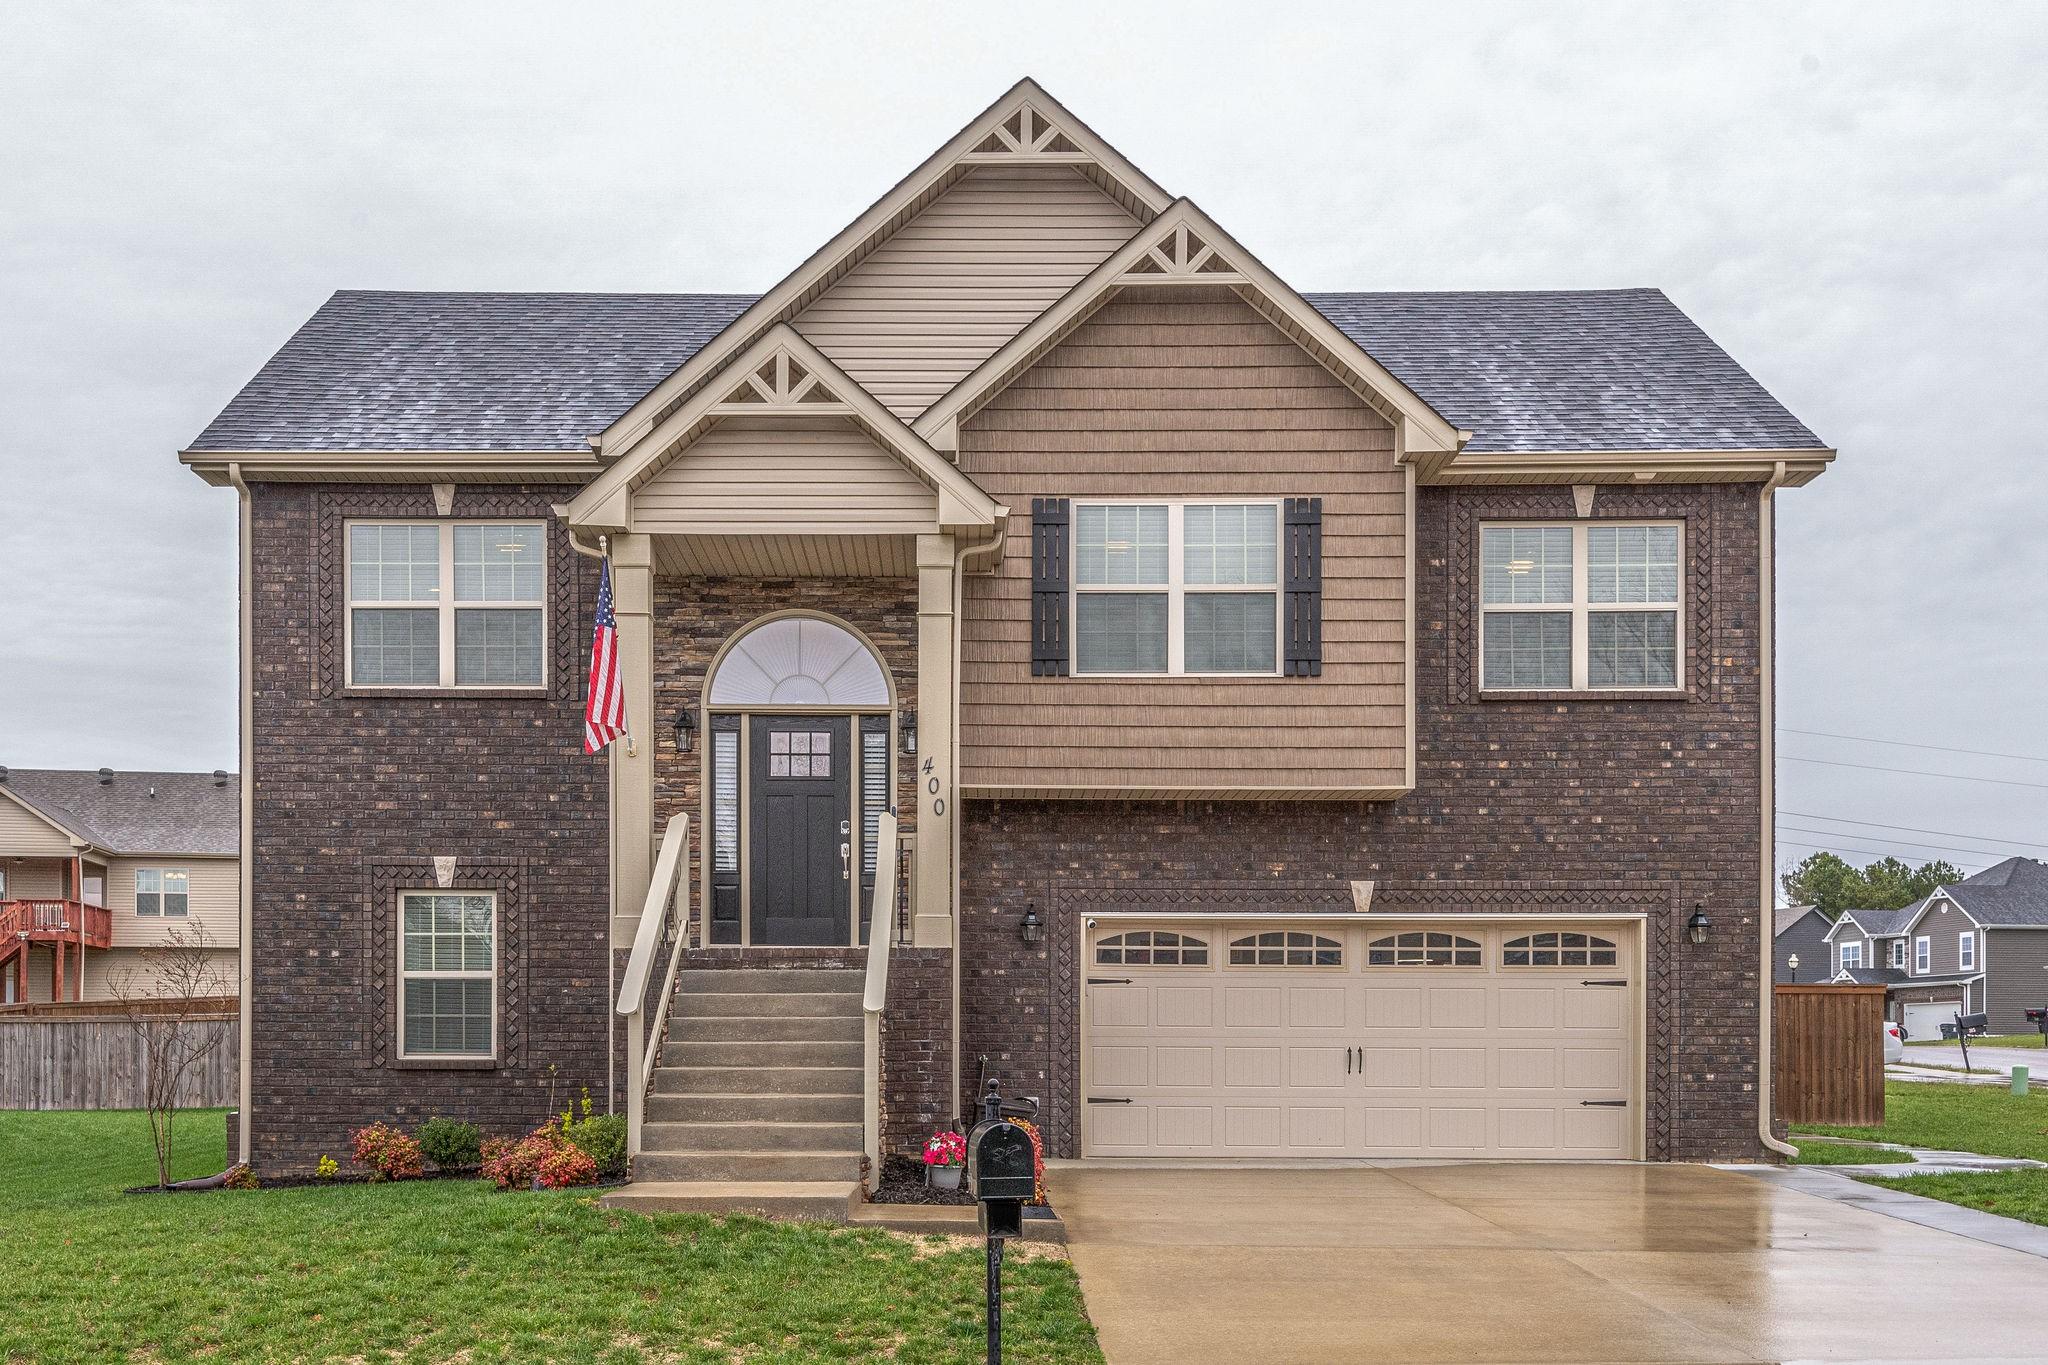 400 Sedgwick Ln, Clarksville, TN 37043 - Clarksville, TN real estate listing